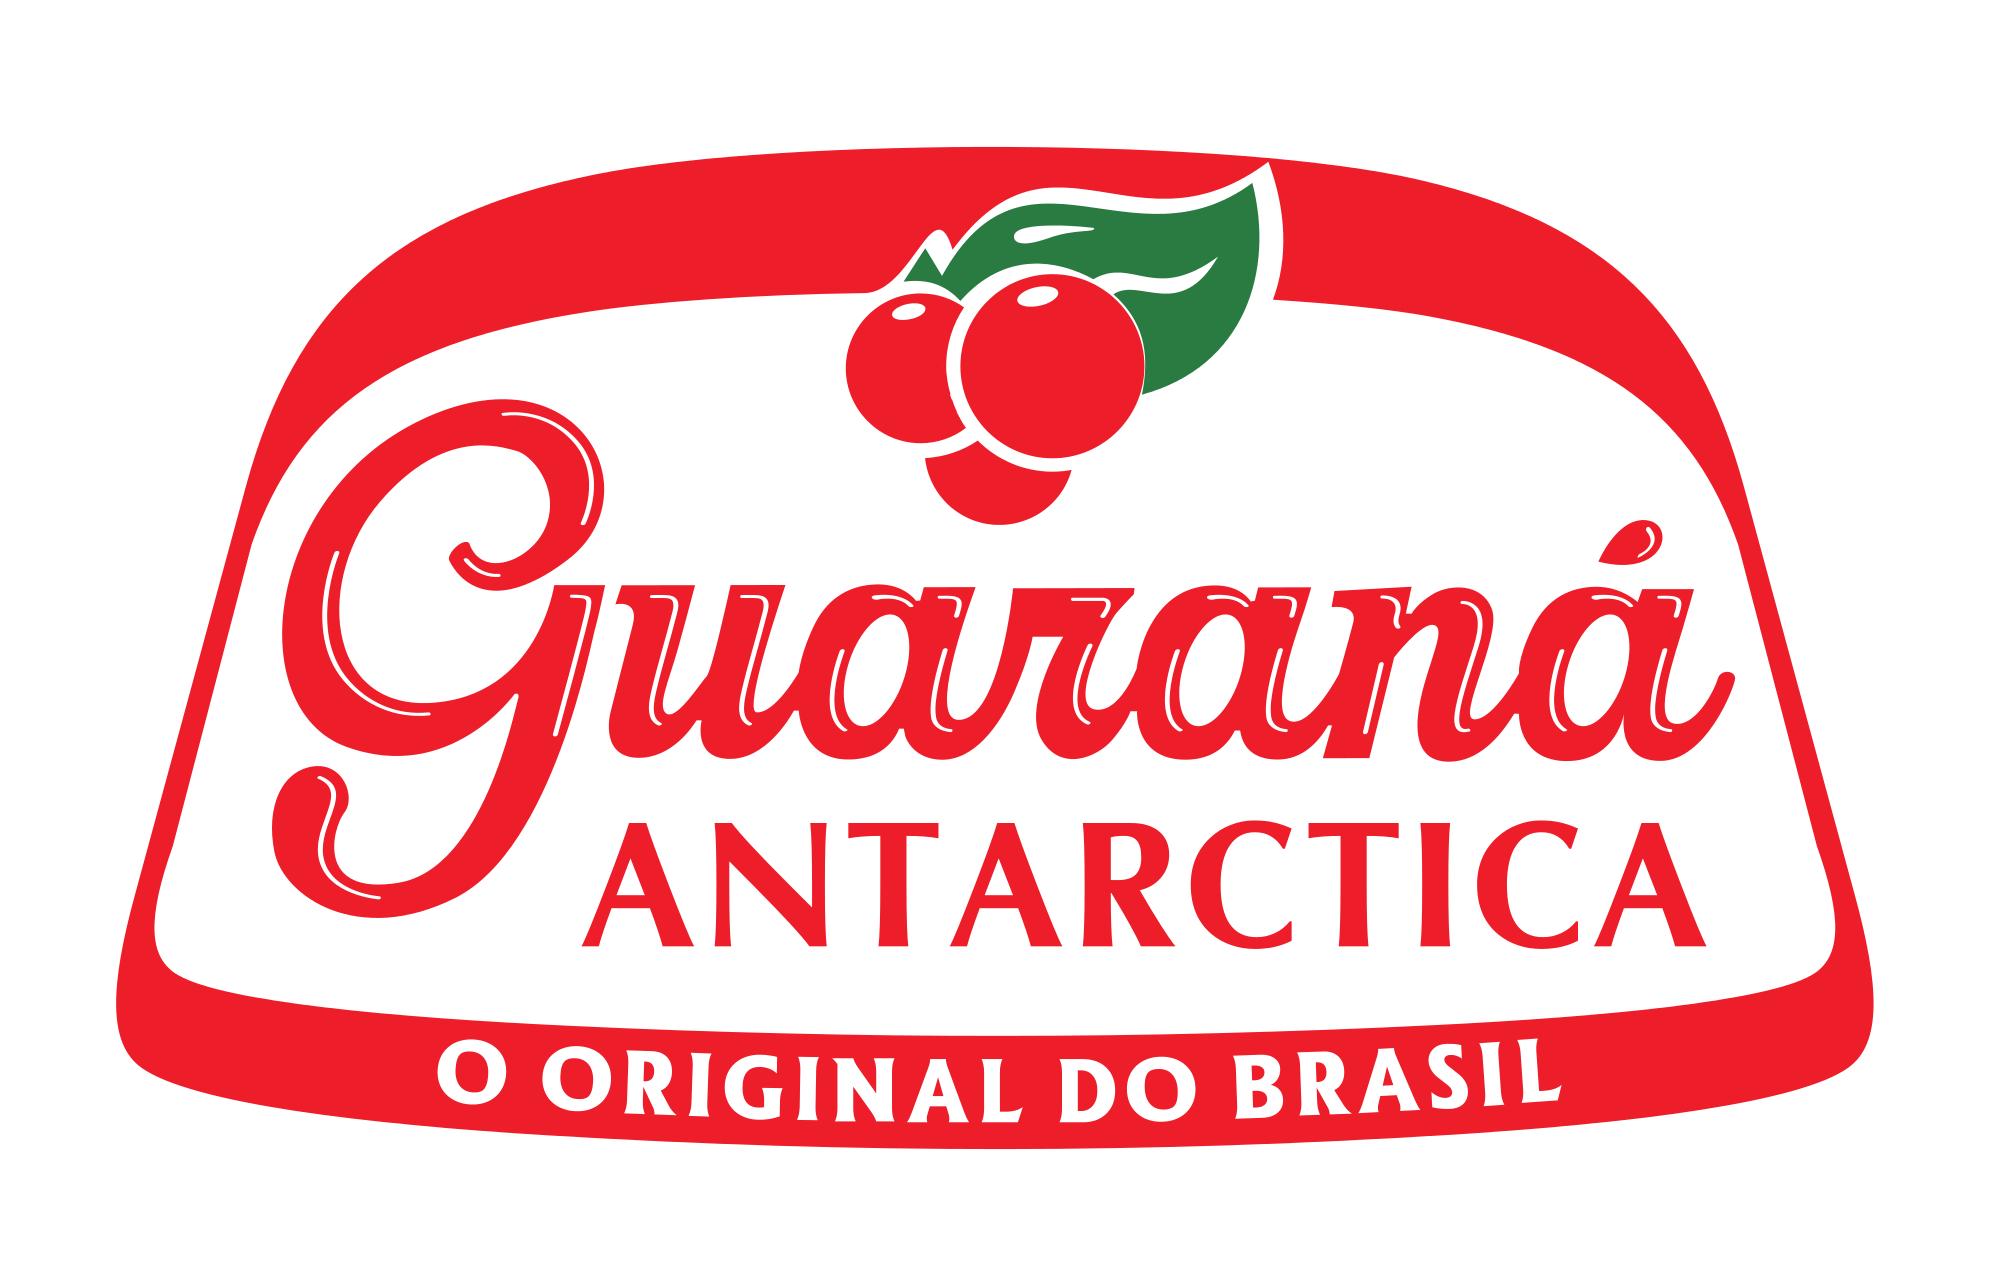 guarana logo - Guaraná Antartica Logo